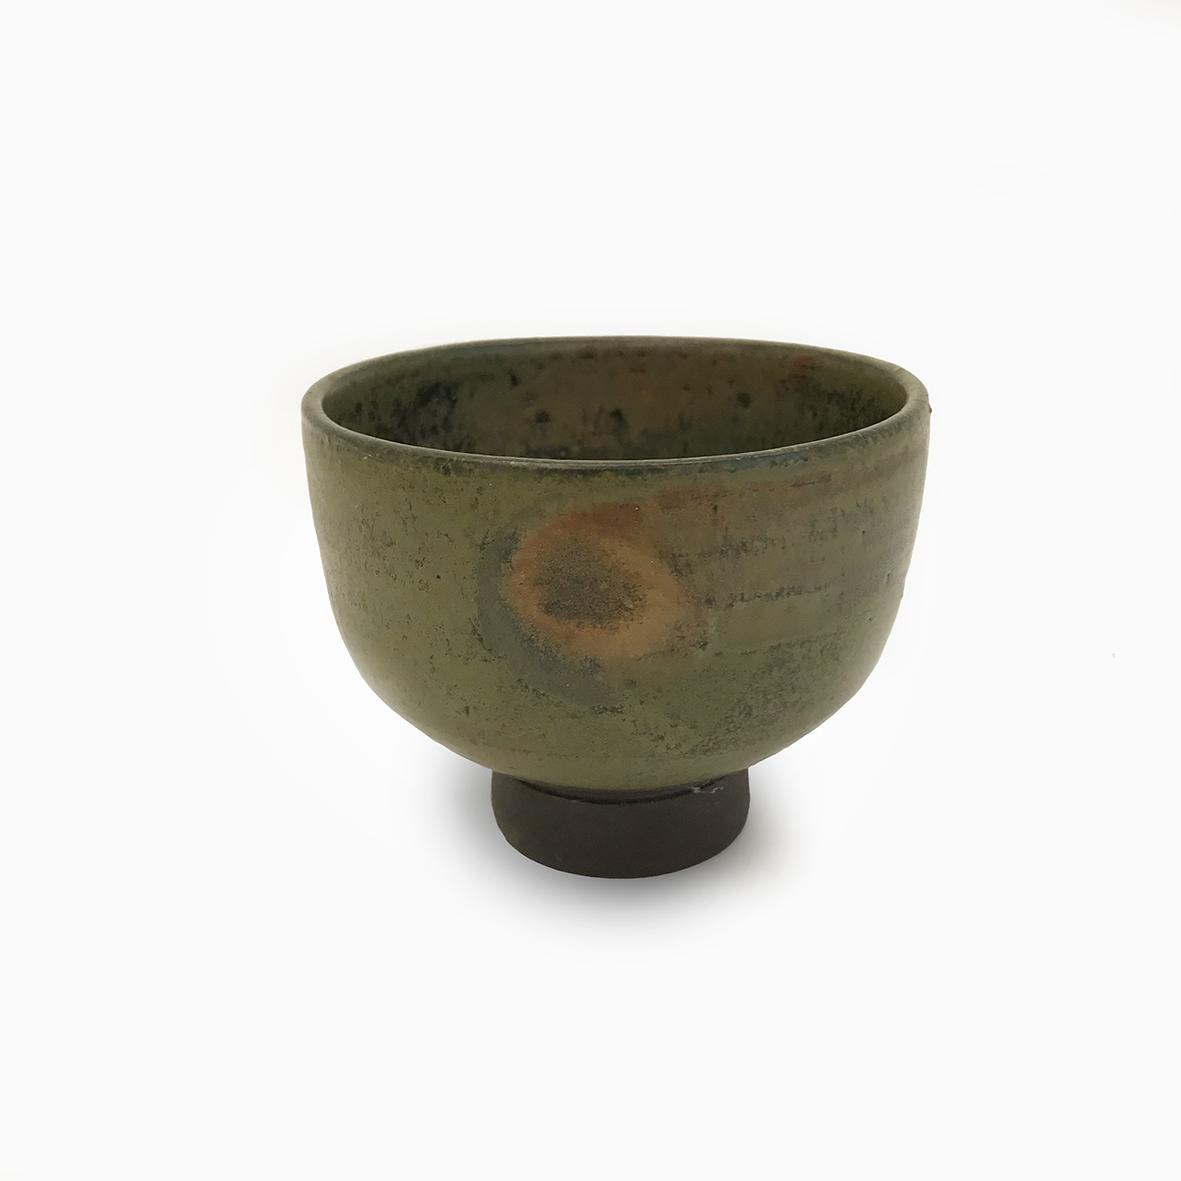 Shawan | Shoji Hamada | Ceramic | Mashiko, Japan | basedonart gallery